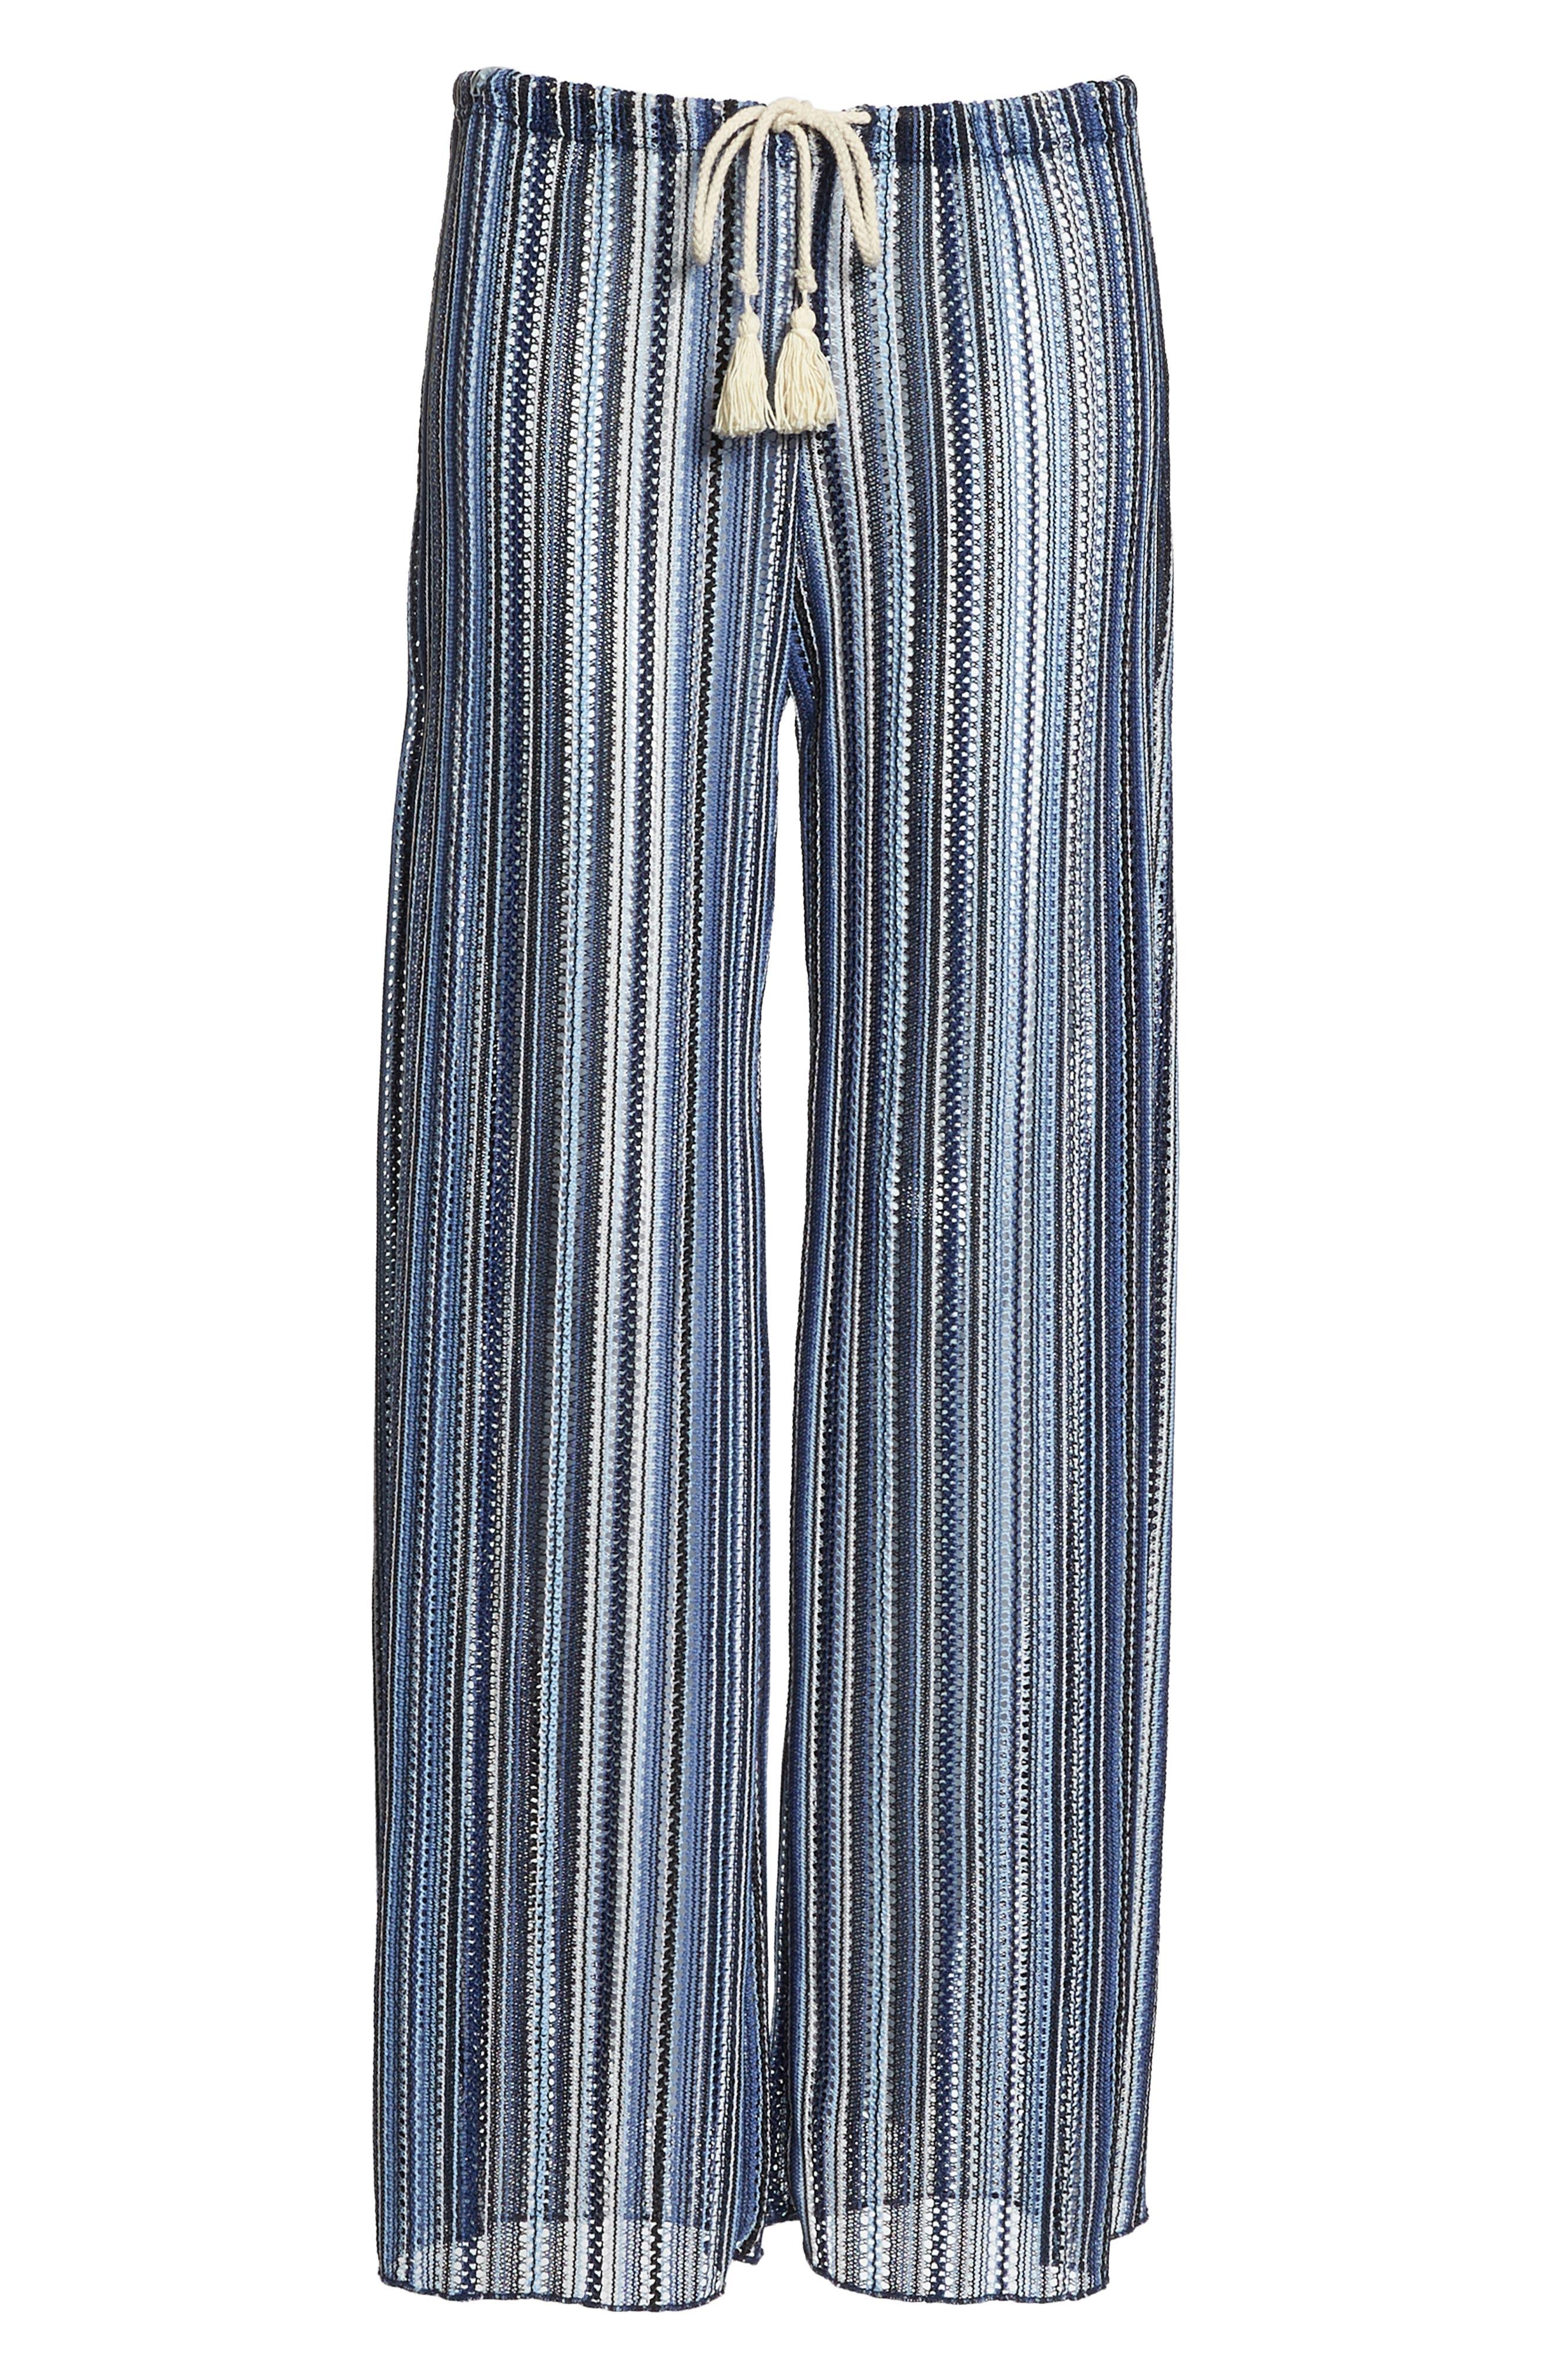 Pierside Cover-Up Flyaway Pants,                             Alternate thumbnail 6, color,                             INDIGO